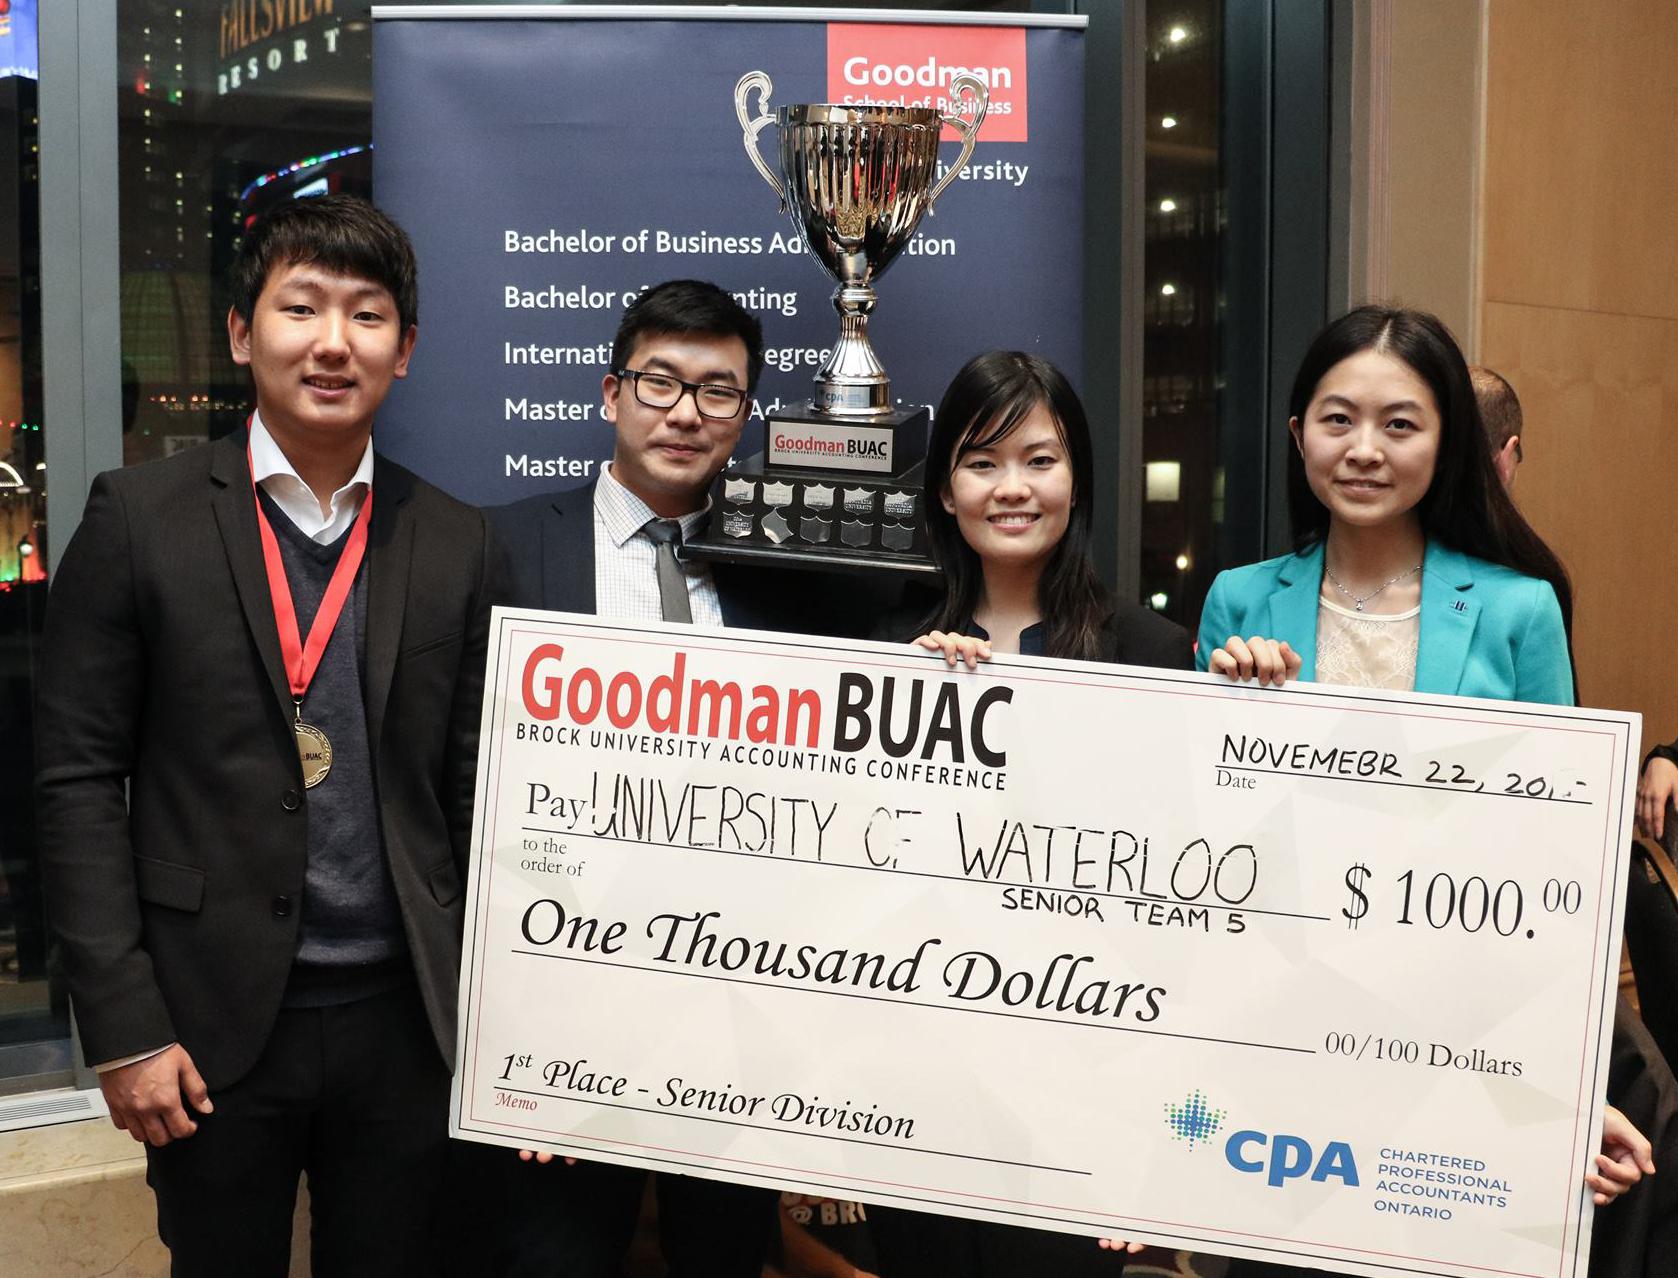 Student winners holding a big Goodman BUAC check